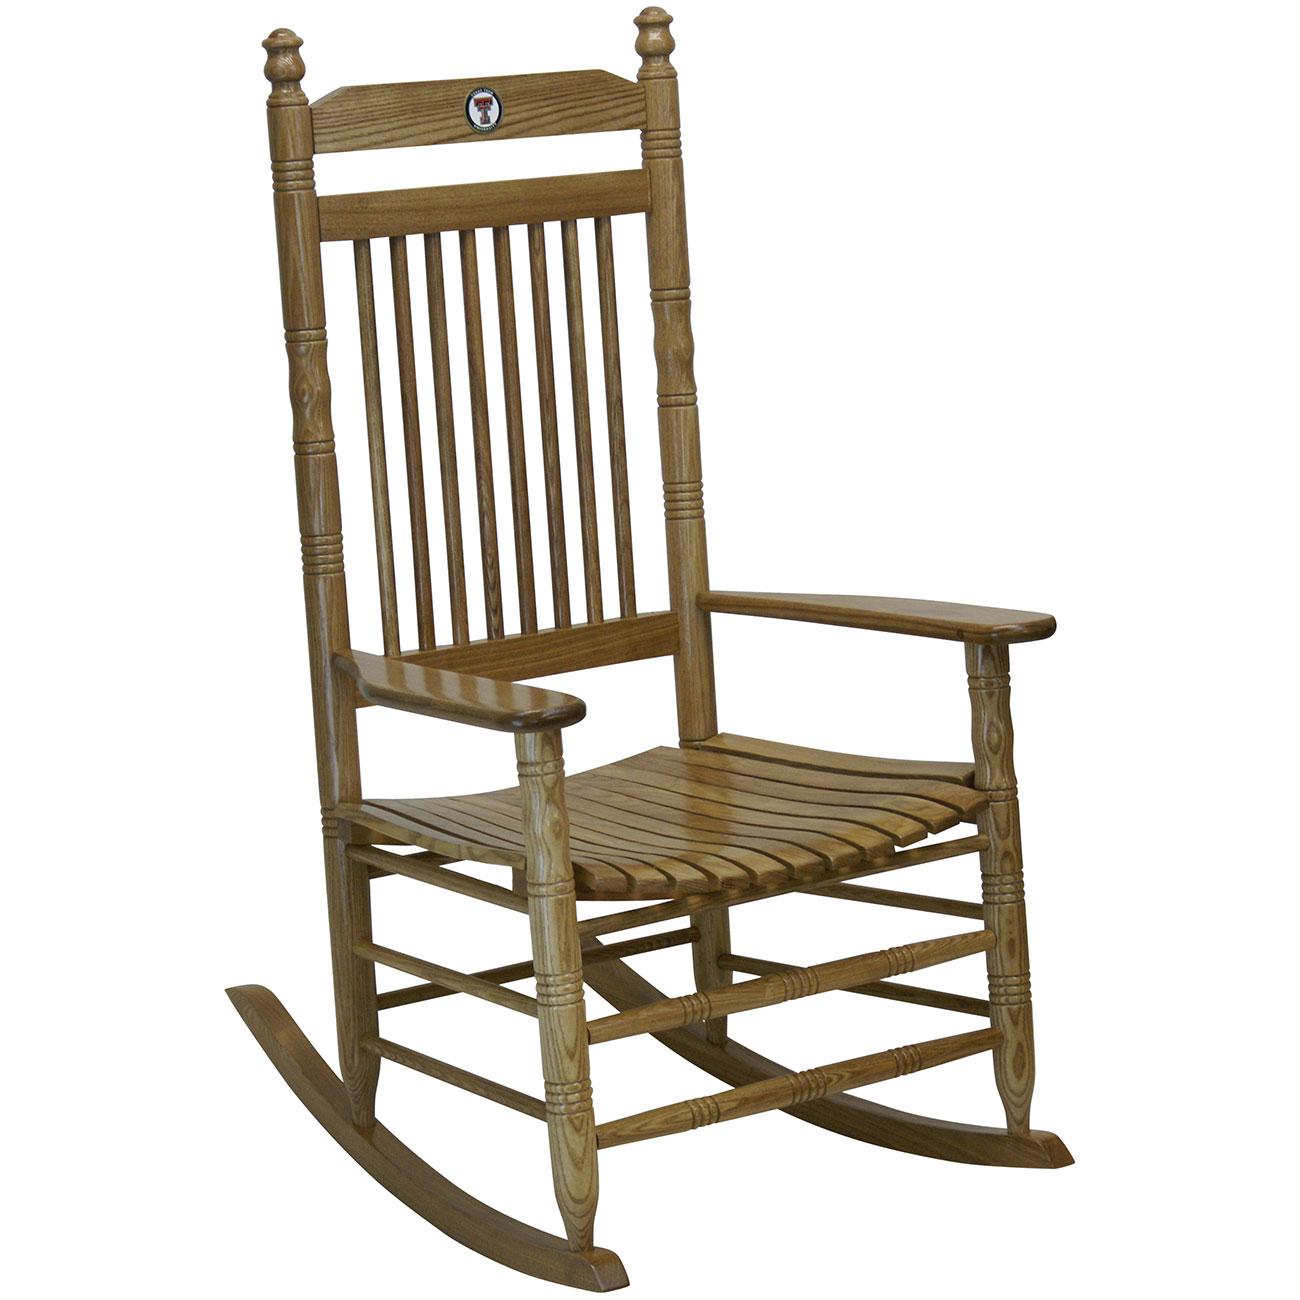 Shop.crackerbarrel.com: Hardwood Rocking Chair   Texas Tech   Cracker  Barrel Old Country Store